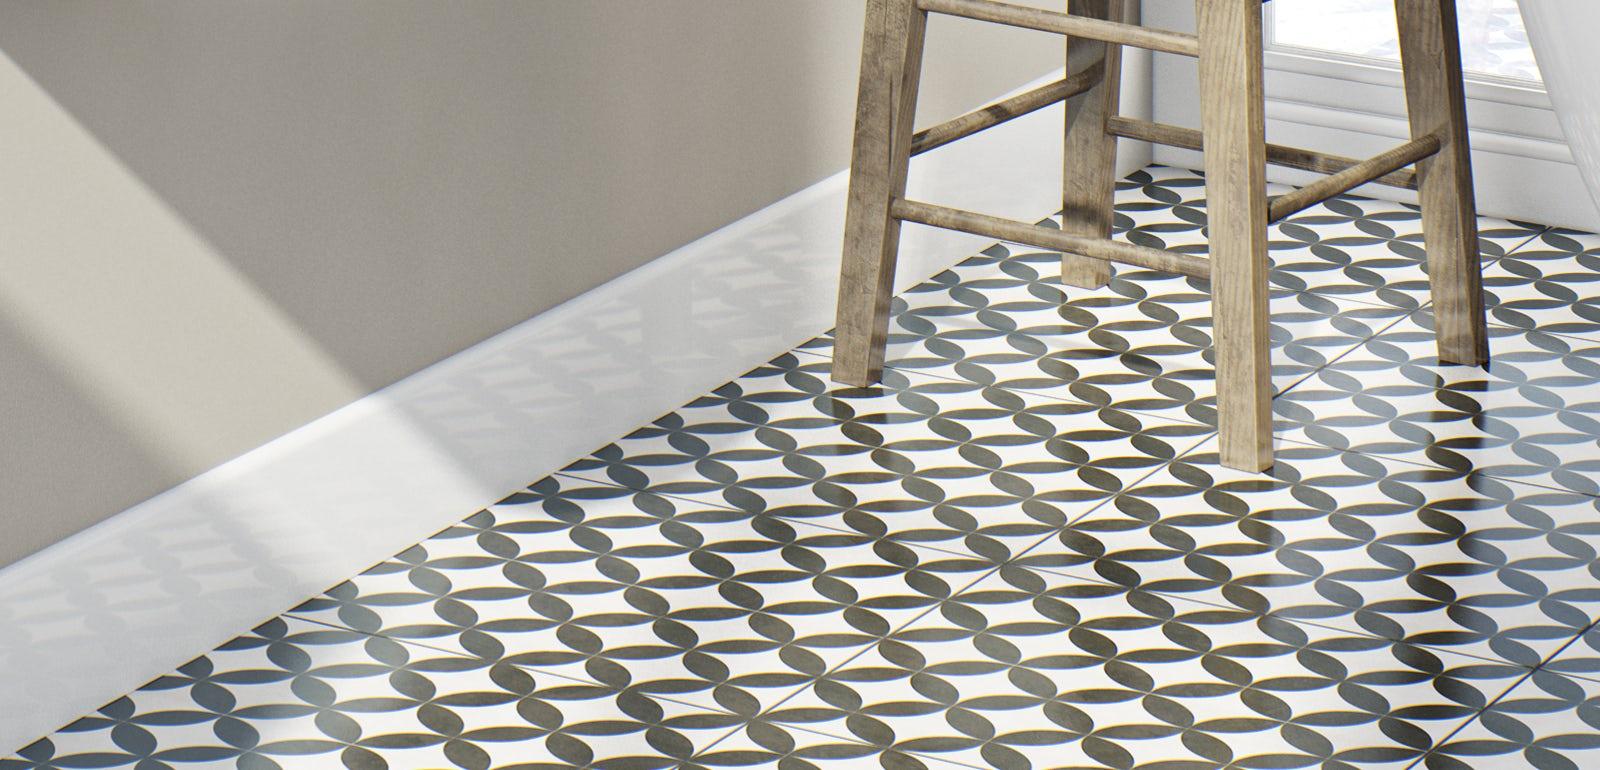 5 great bathroom flooring ideas | victoriaplum